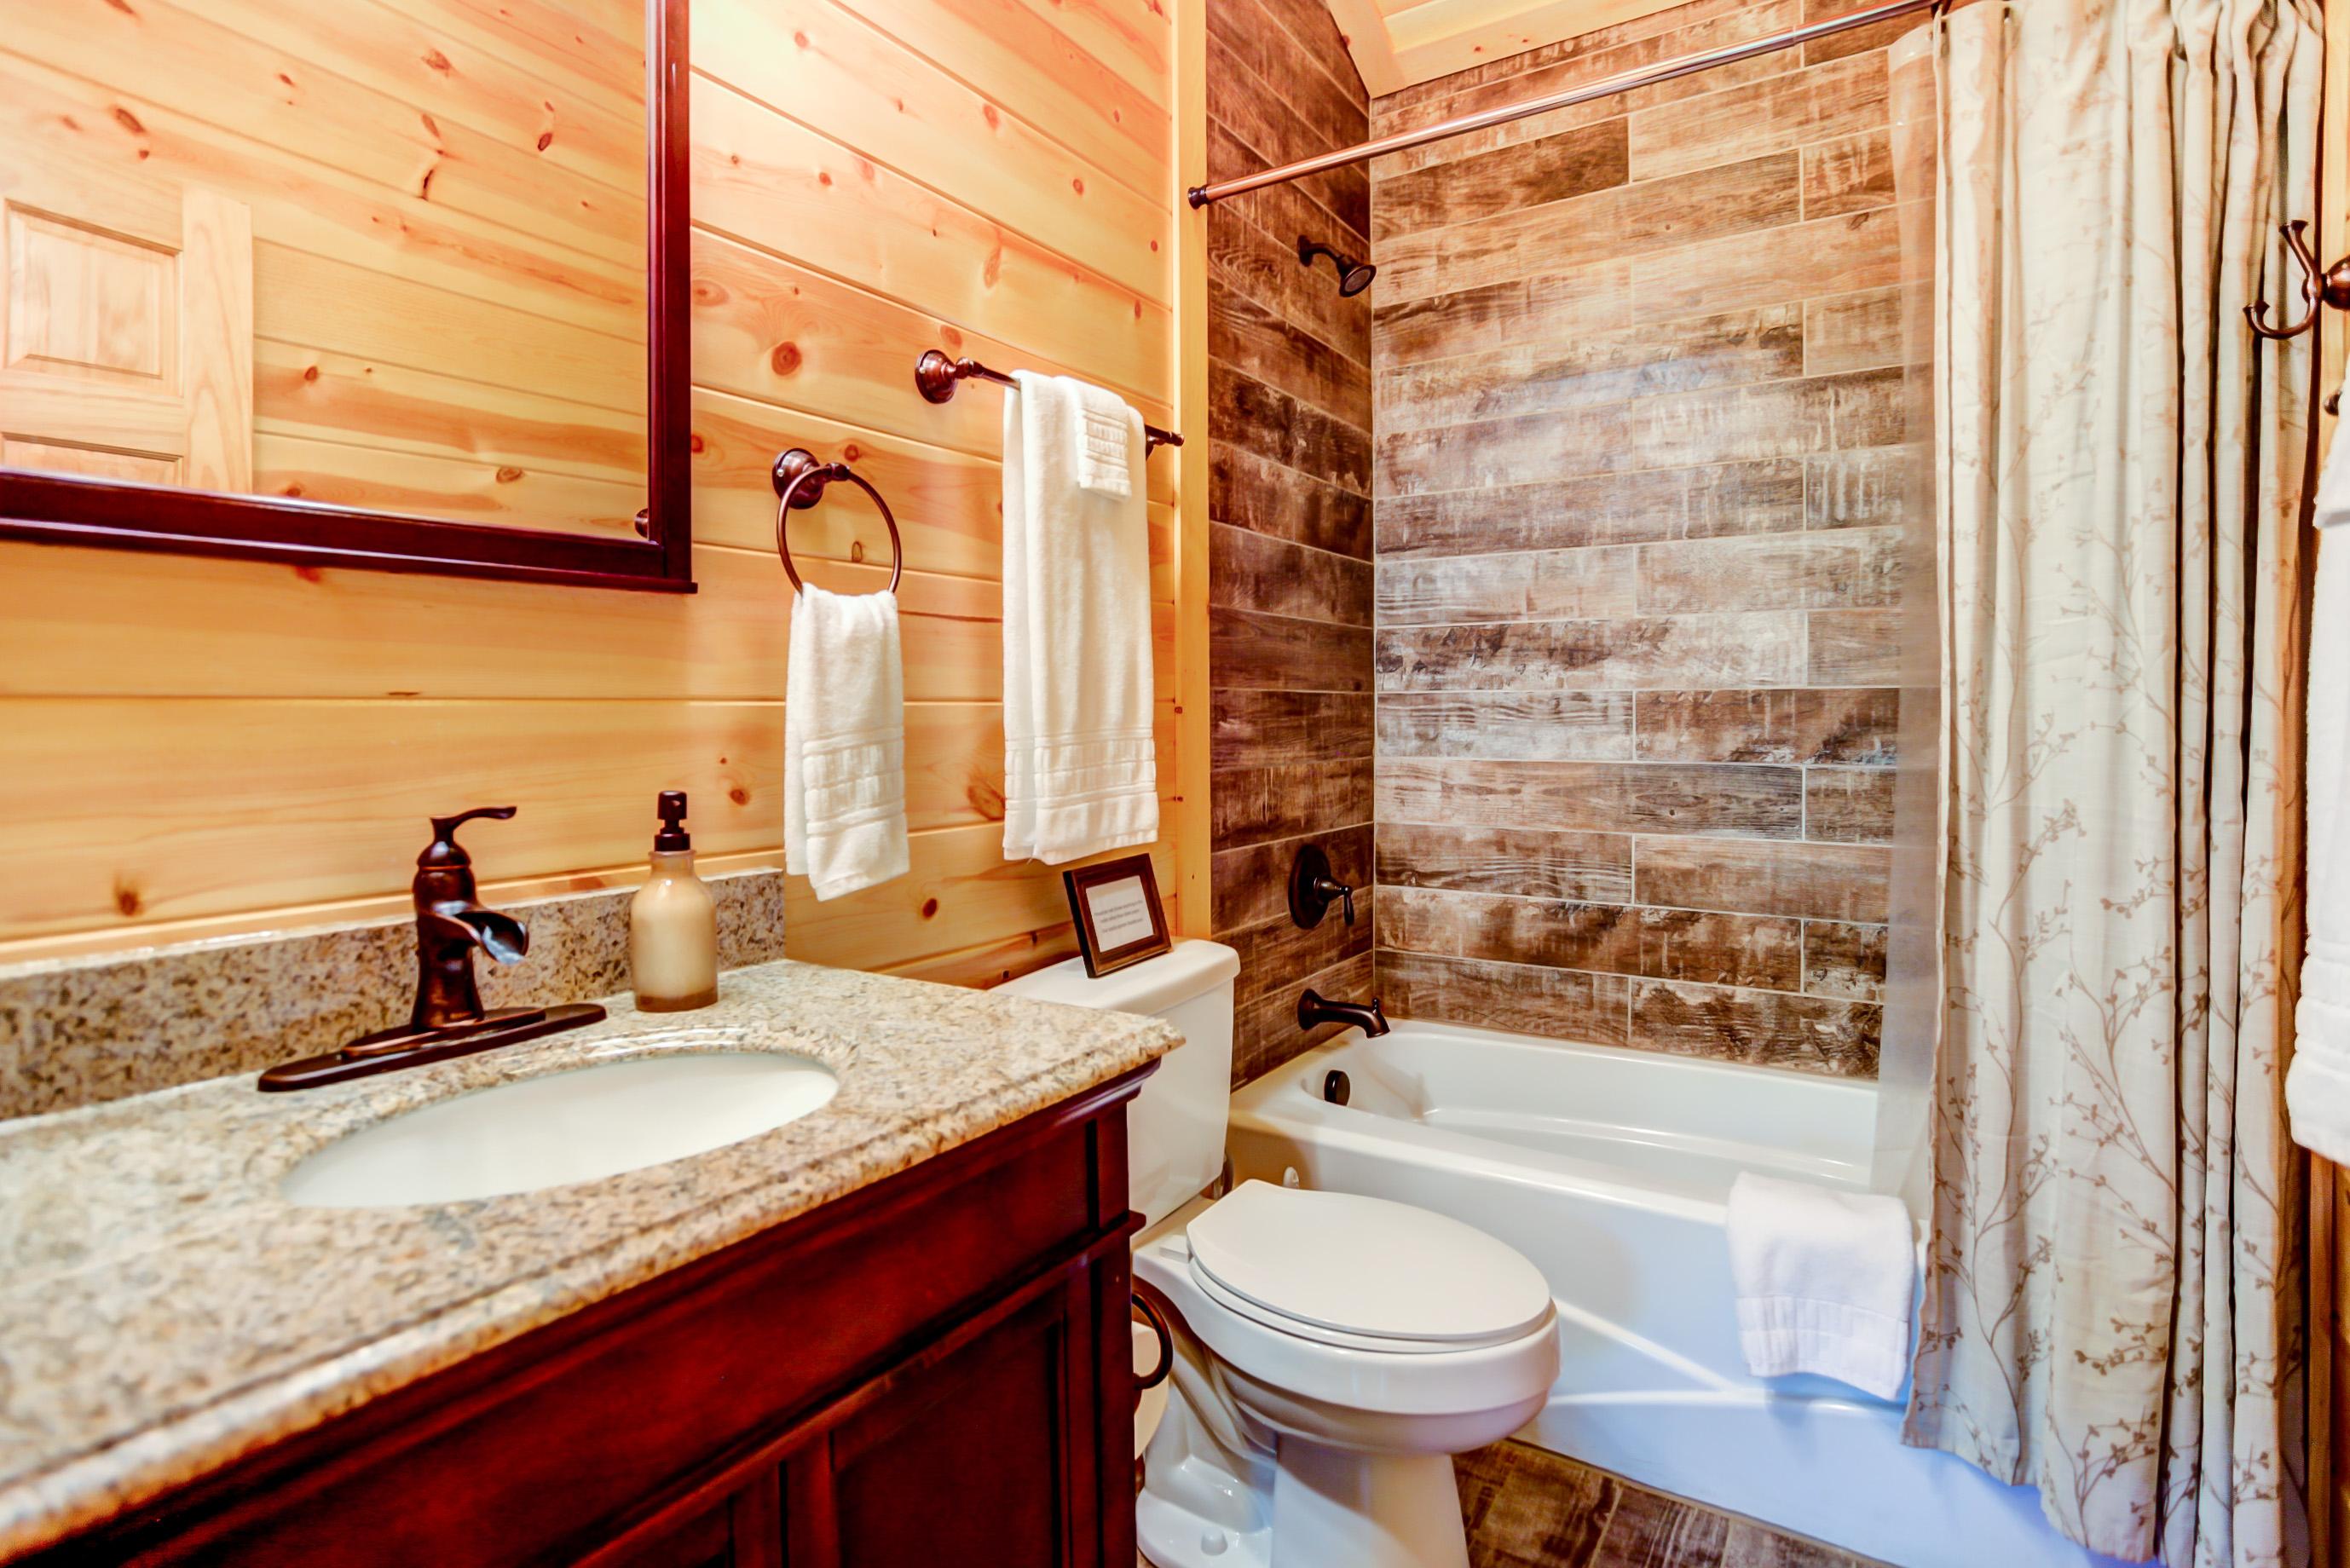 Bathroom - bathroom with tub